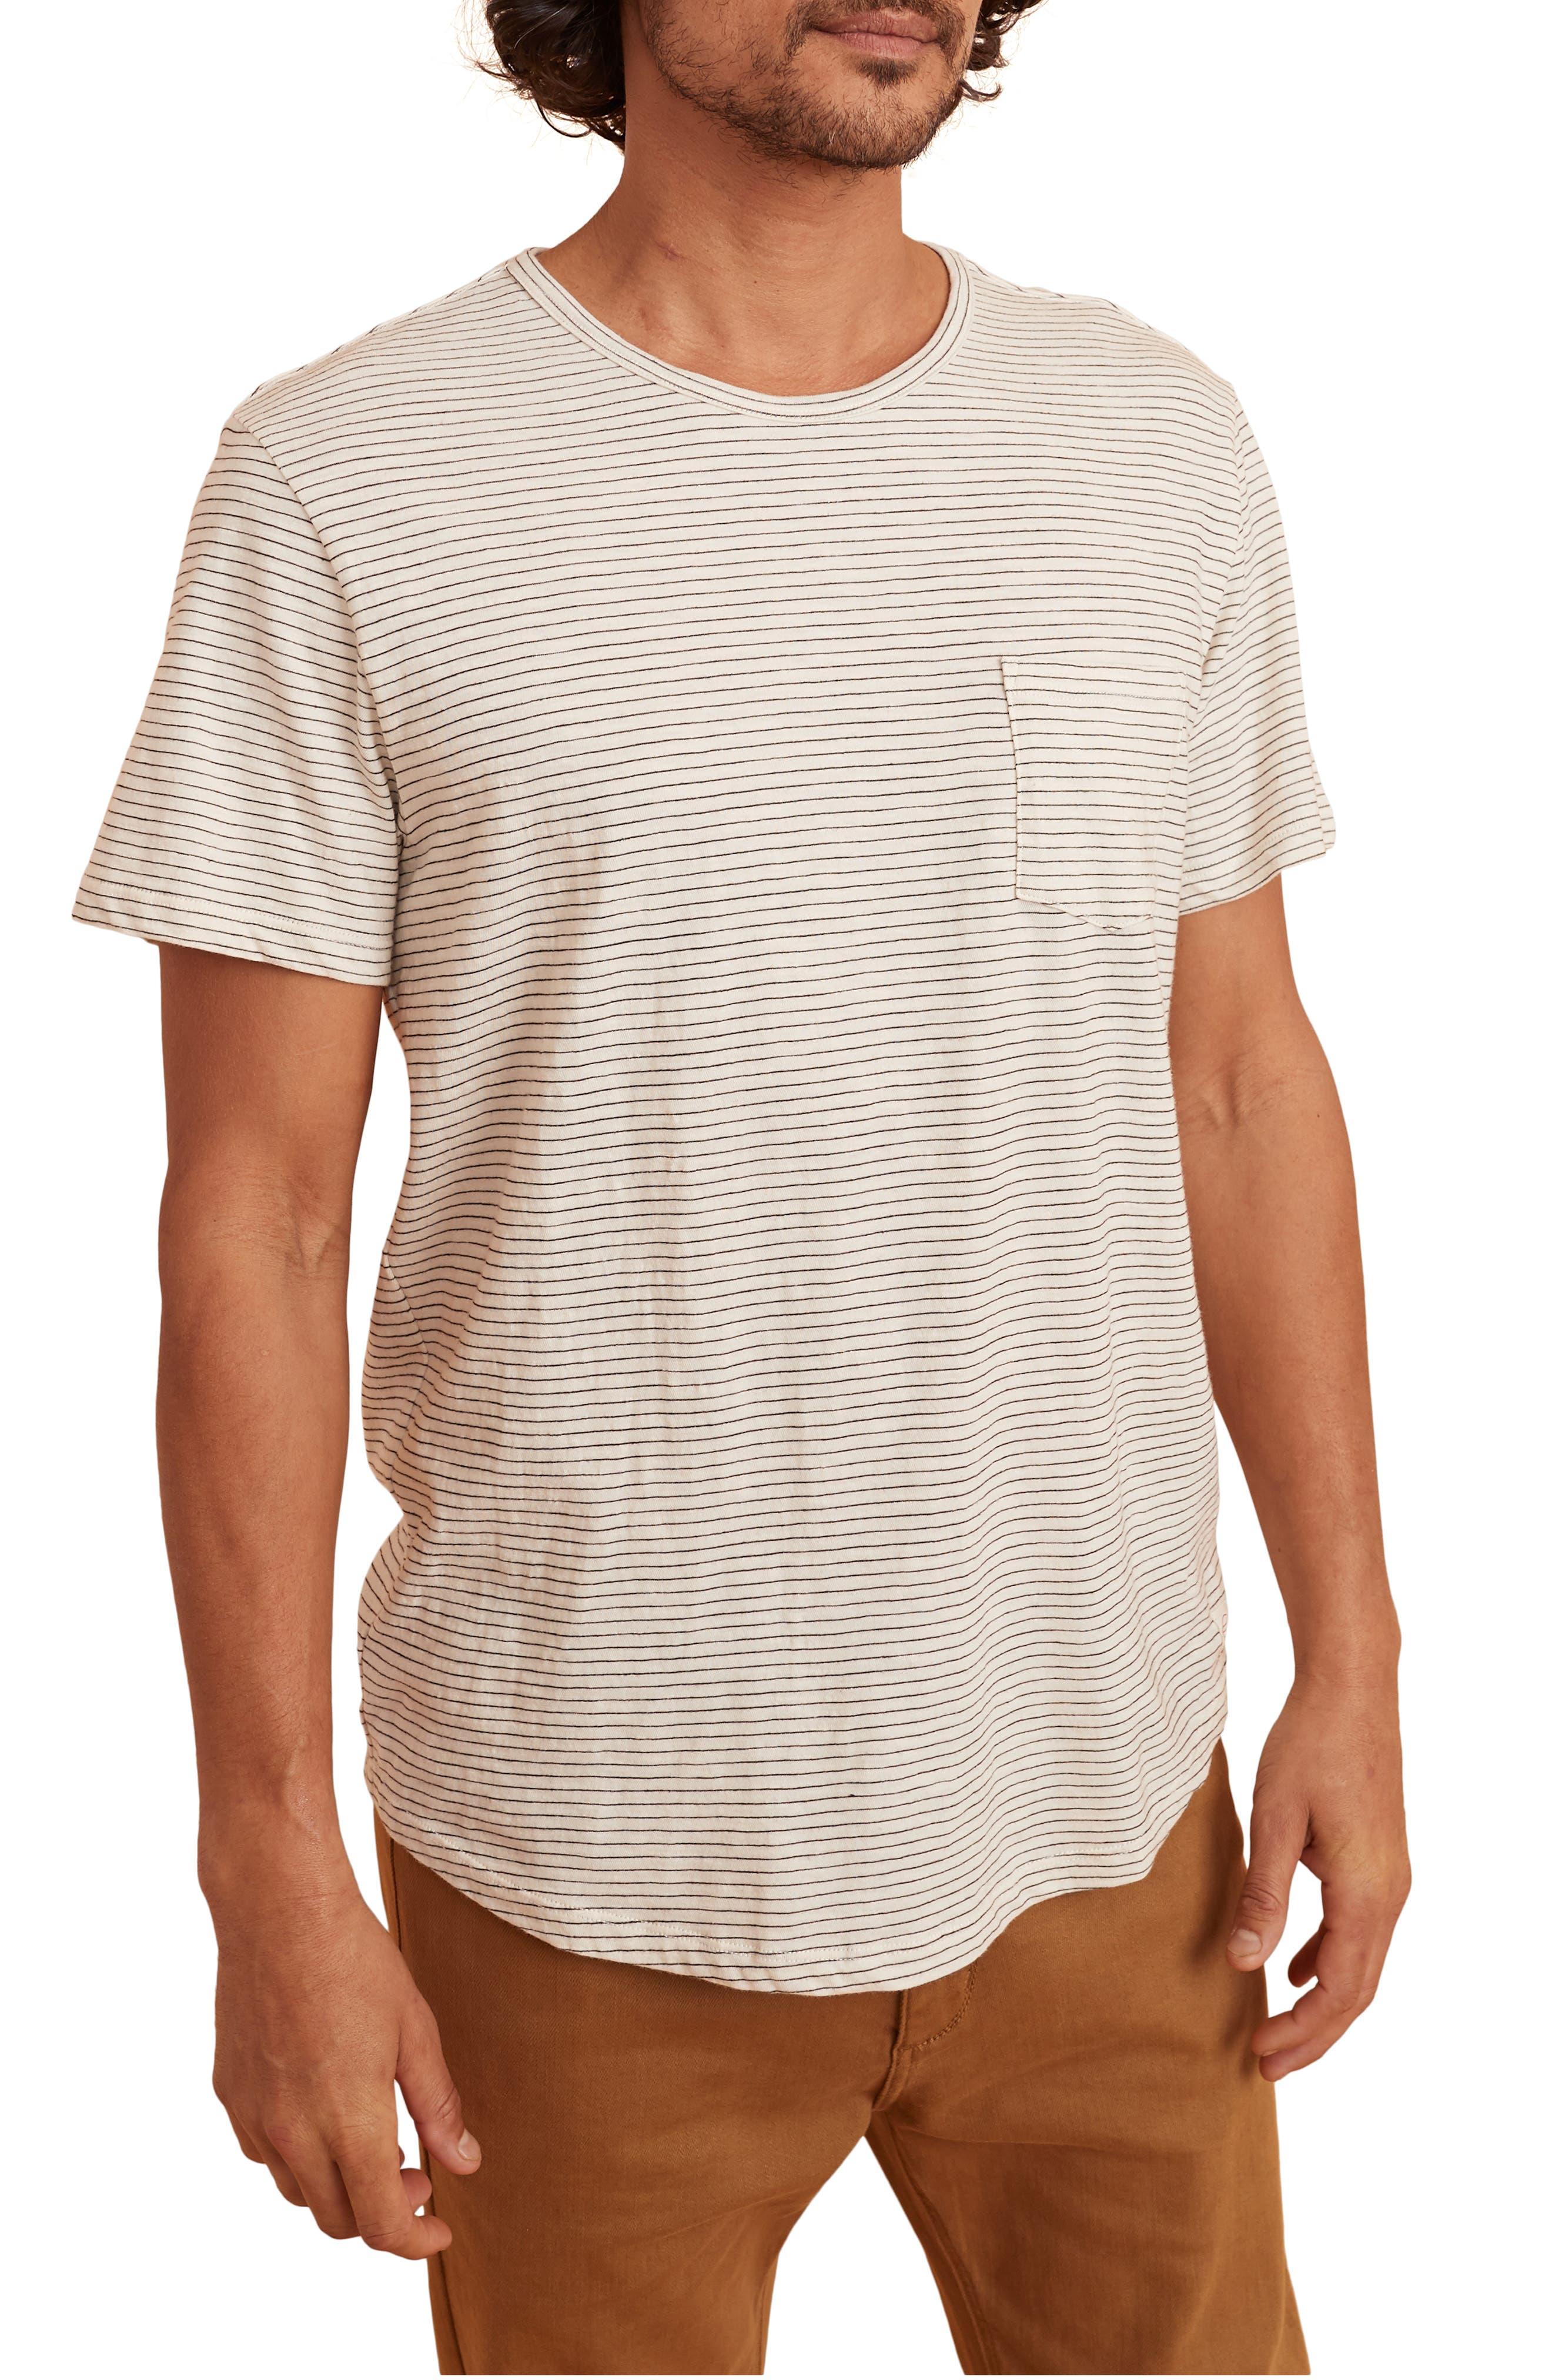 Saddle Stripe Pocket T-Shirt